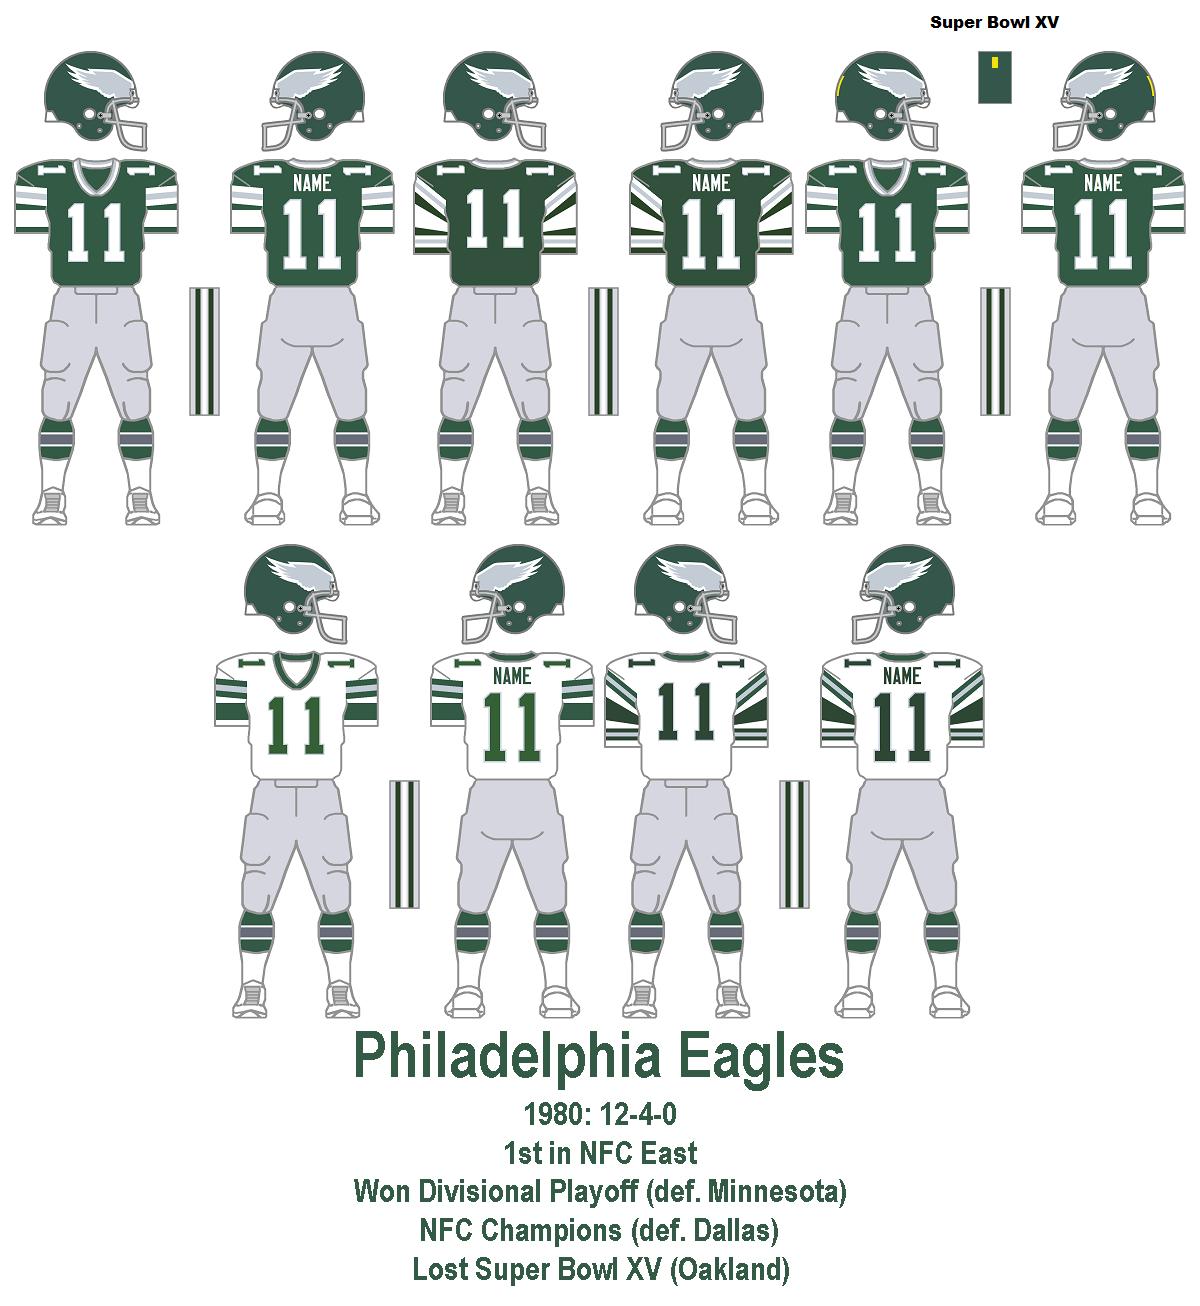 1980 Eagles